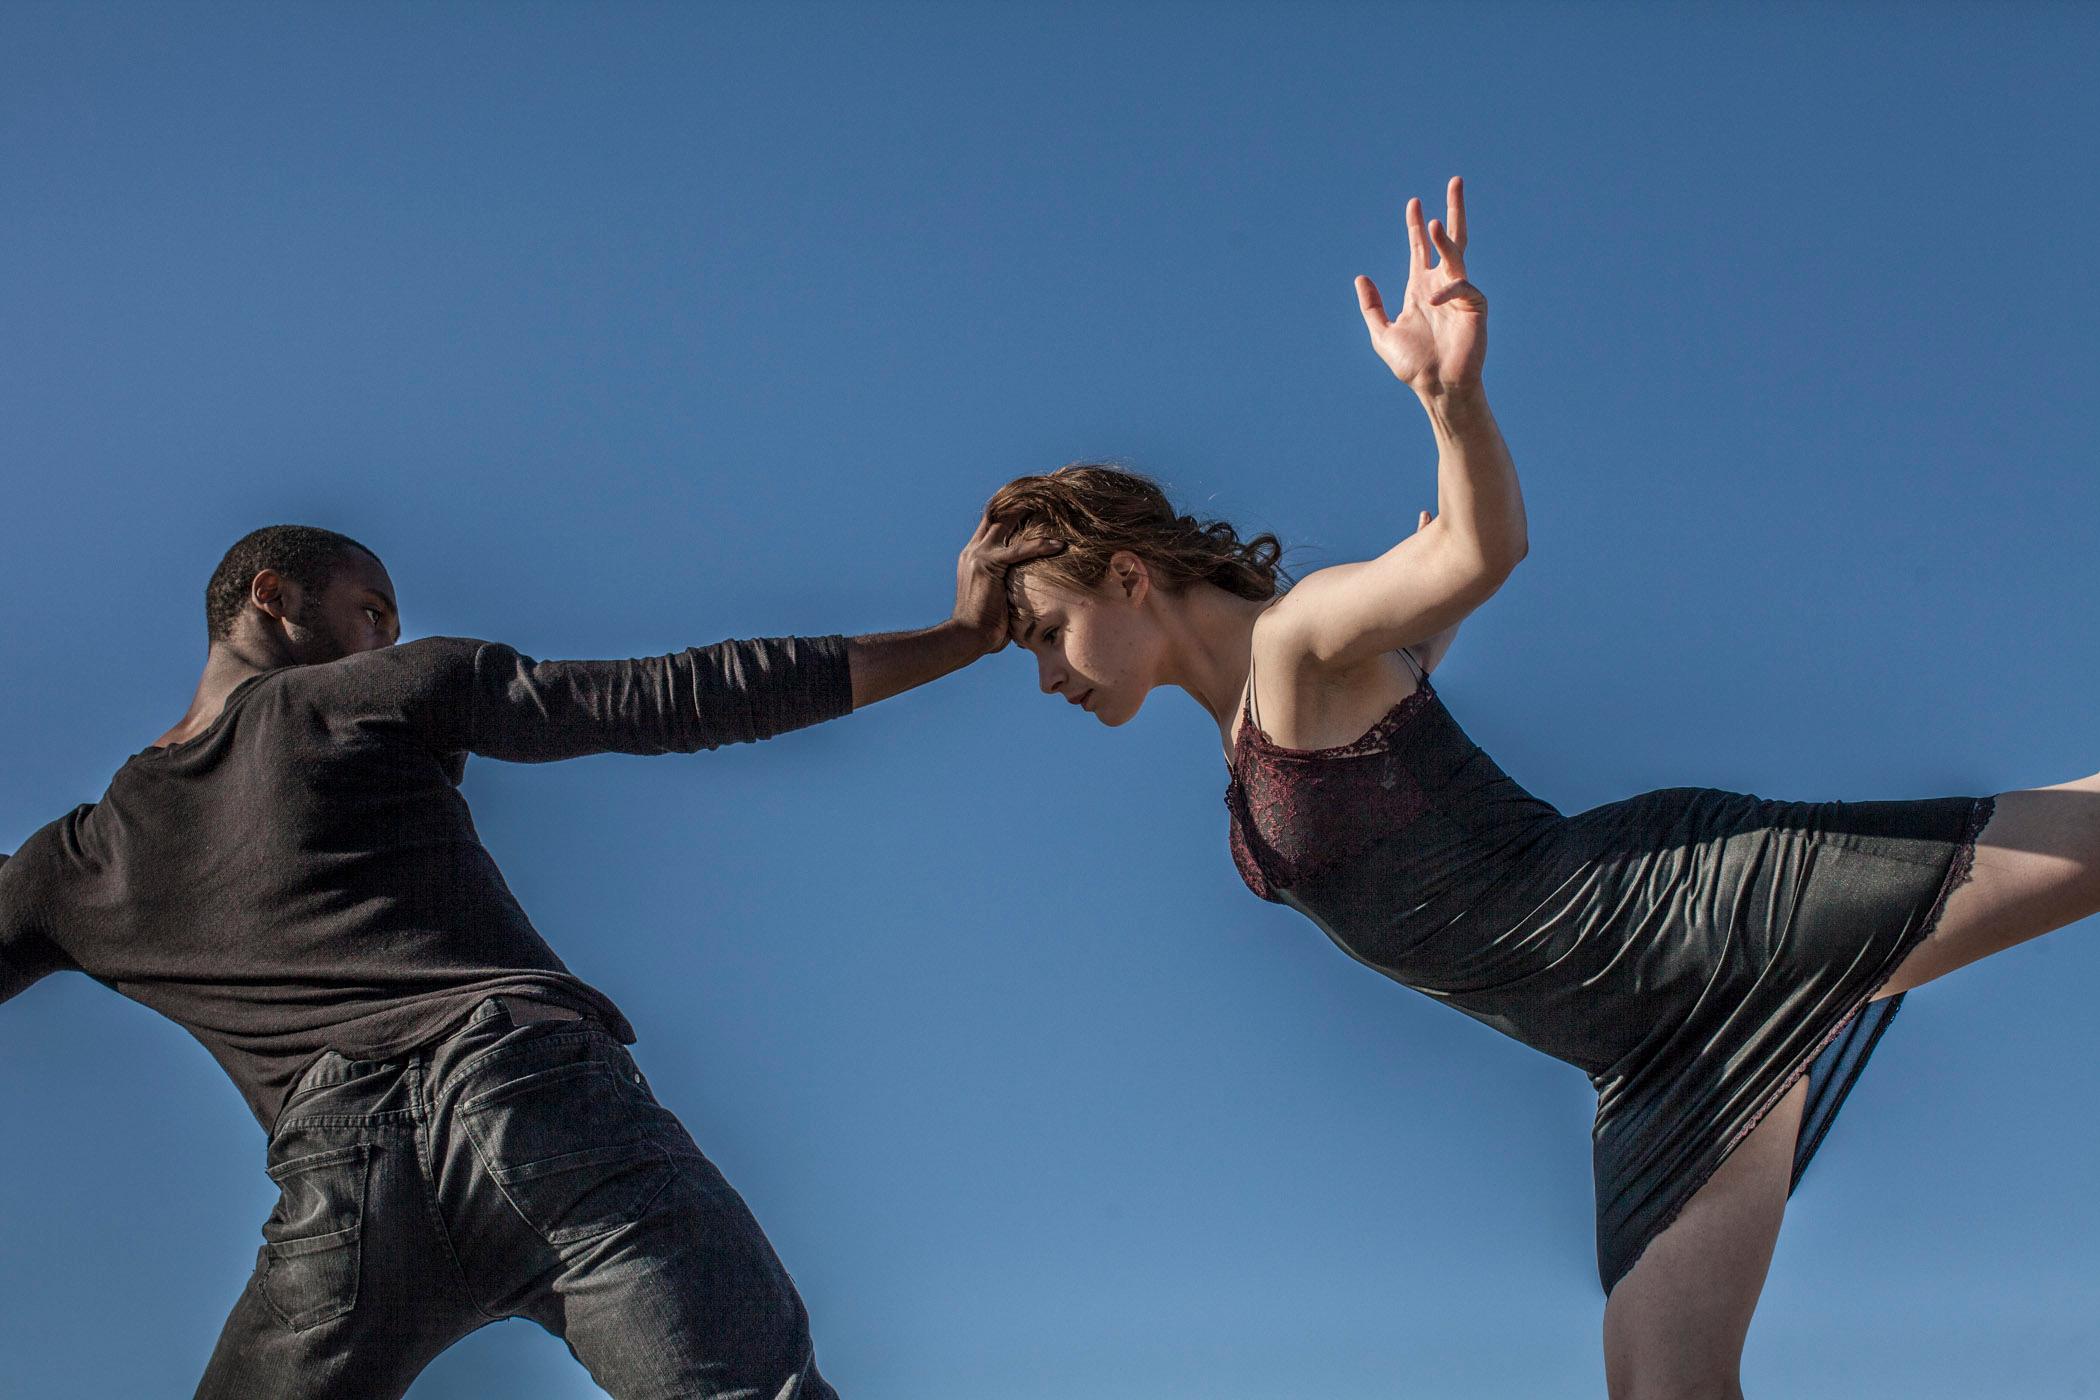 Babatunji Johnson & Megan Wright copy (1).jpg